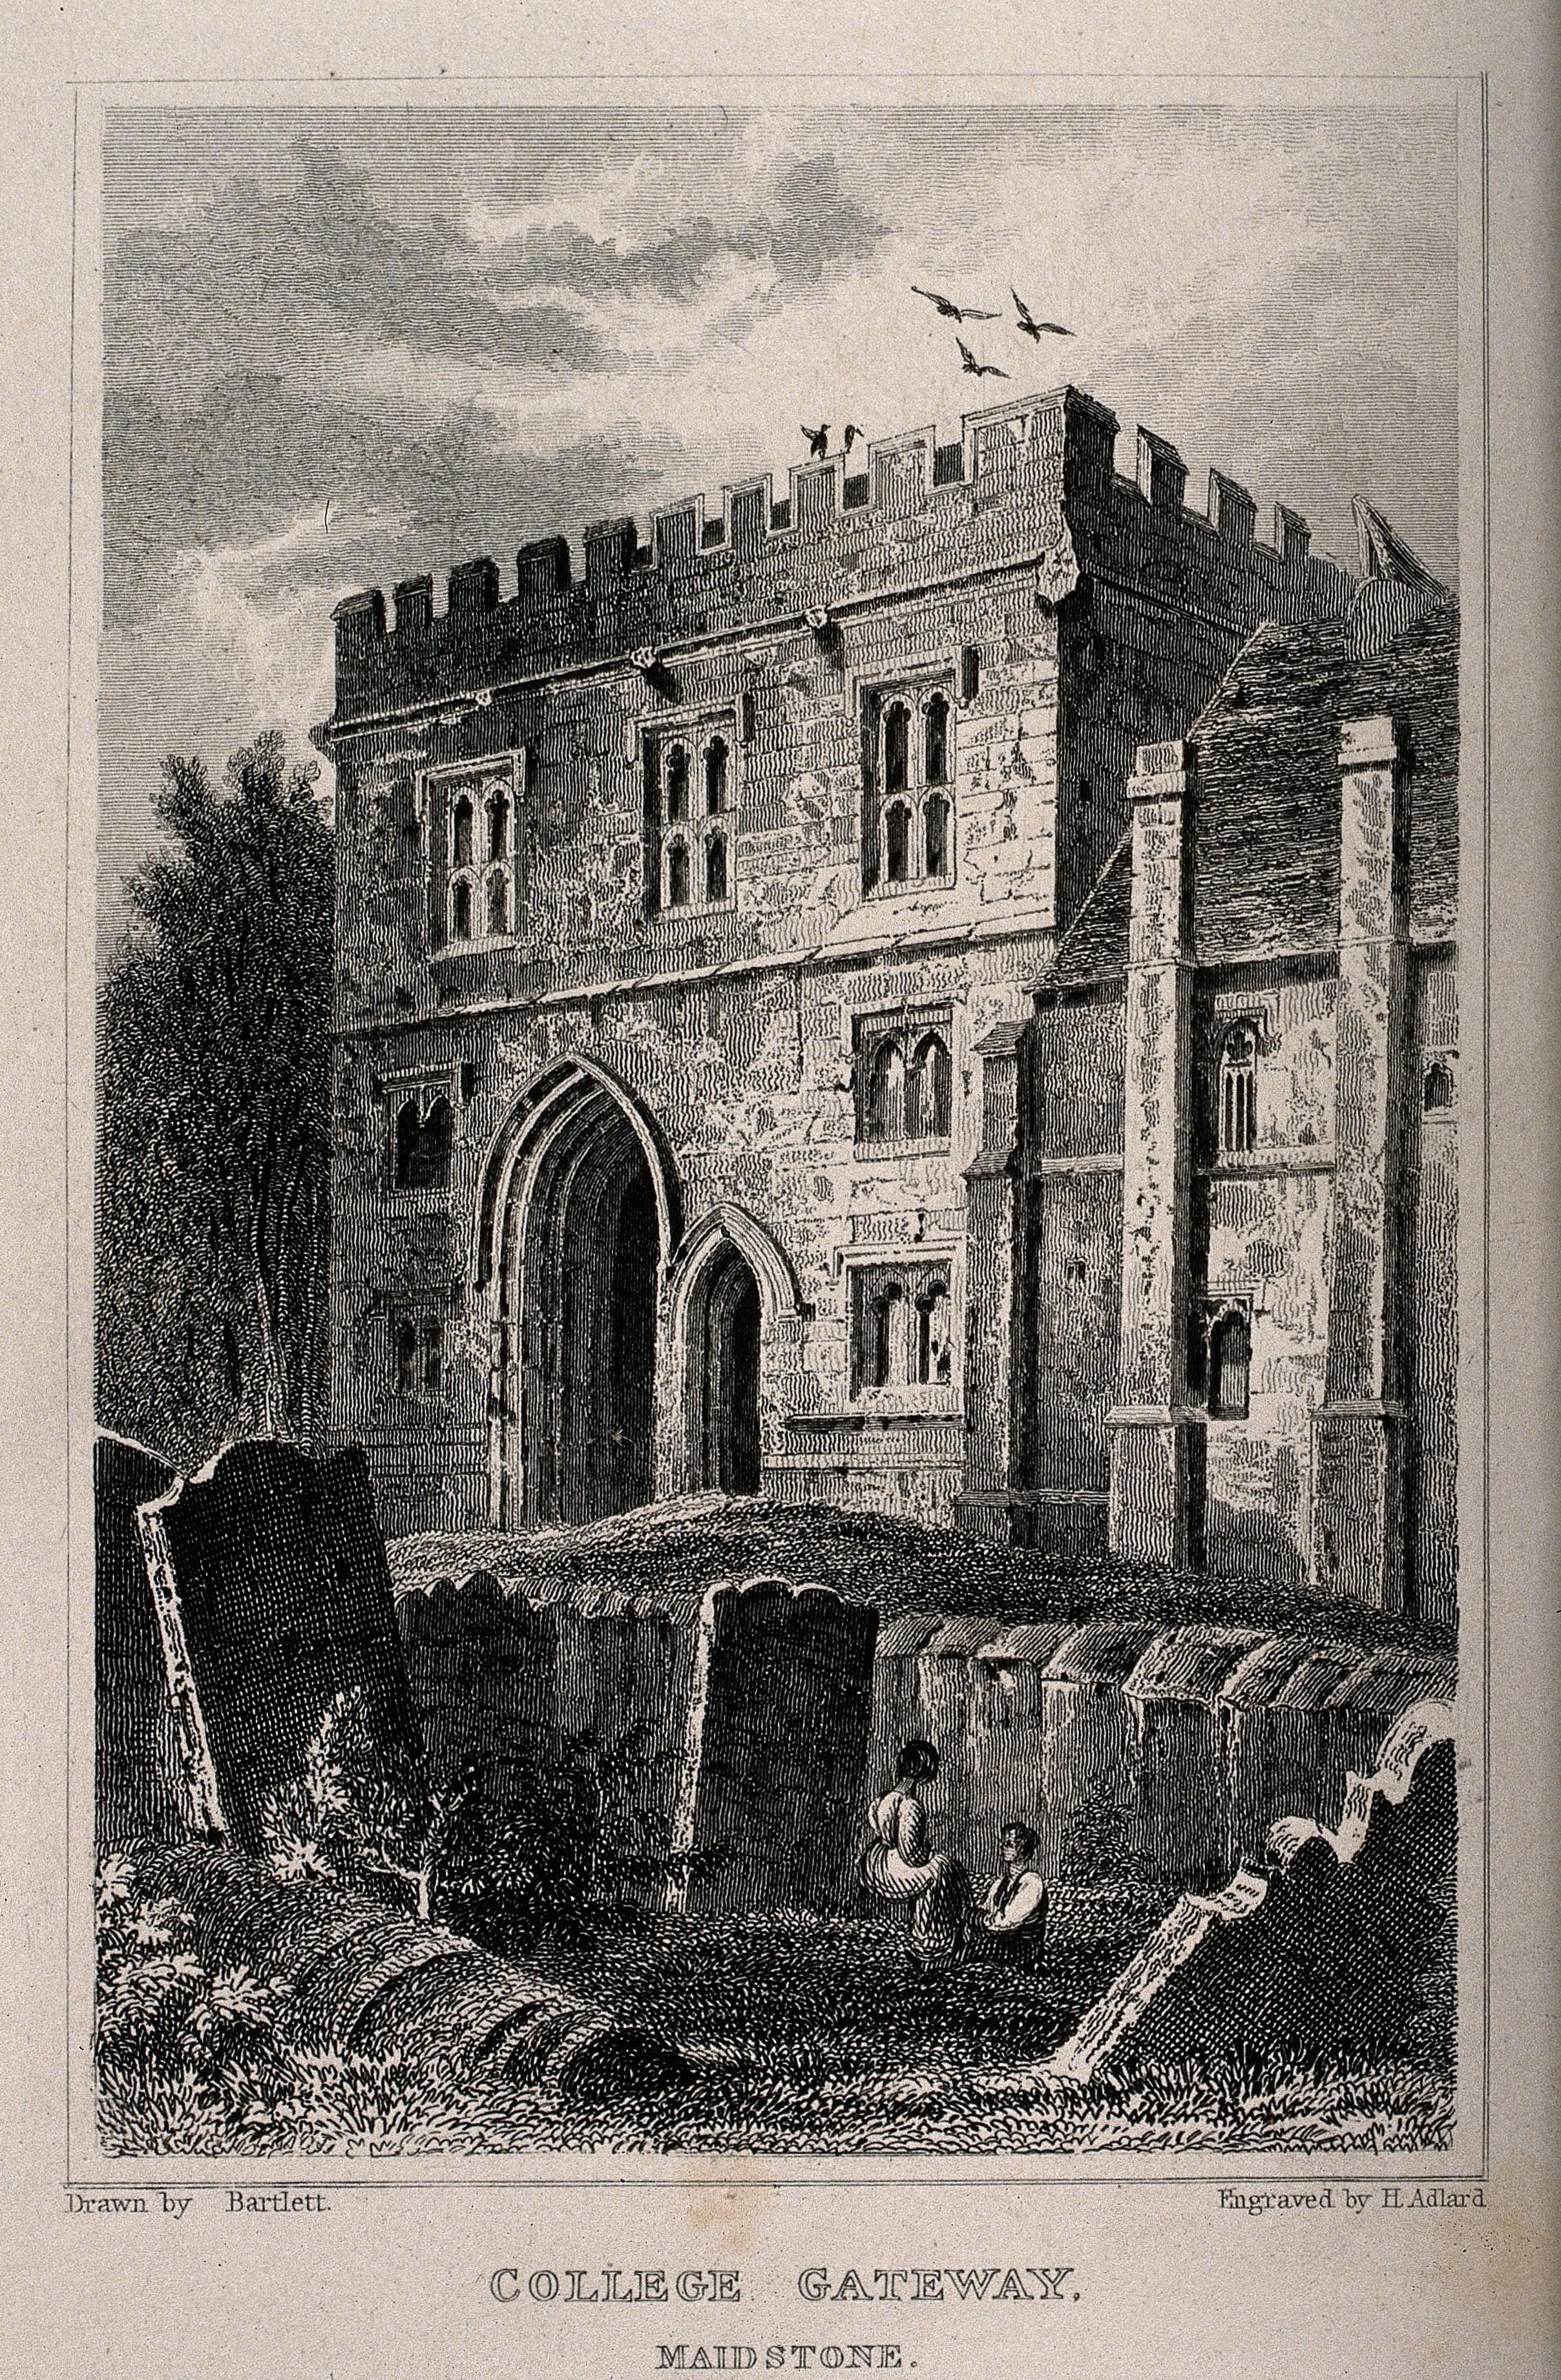 Adlar file:college gateway, maidstone, kent. line engravingh